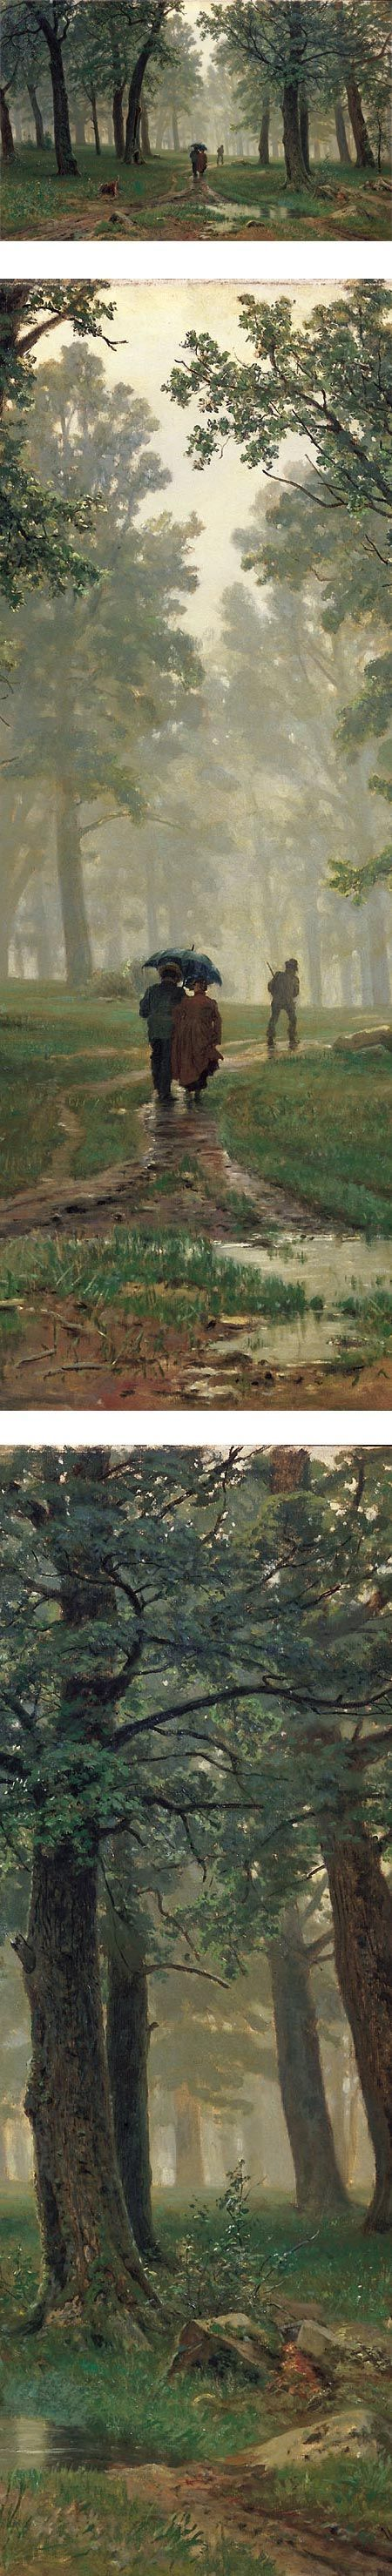 Rain in an Oak Forest, Ivan Shishkin